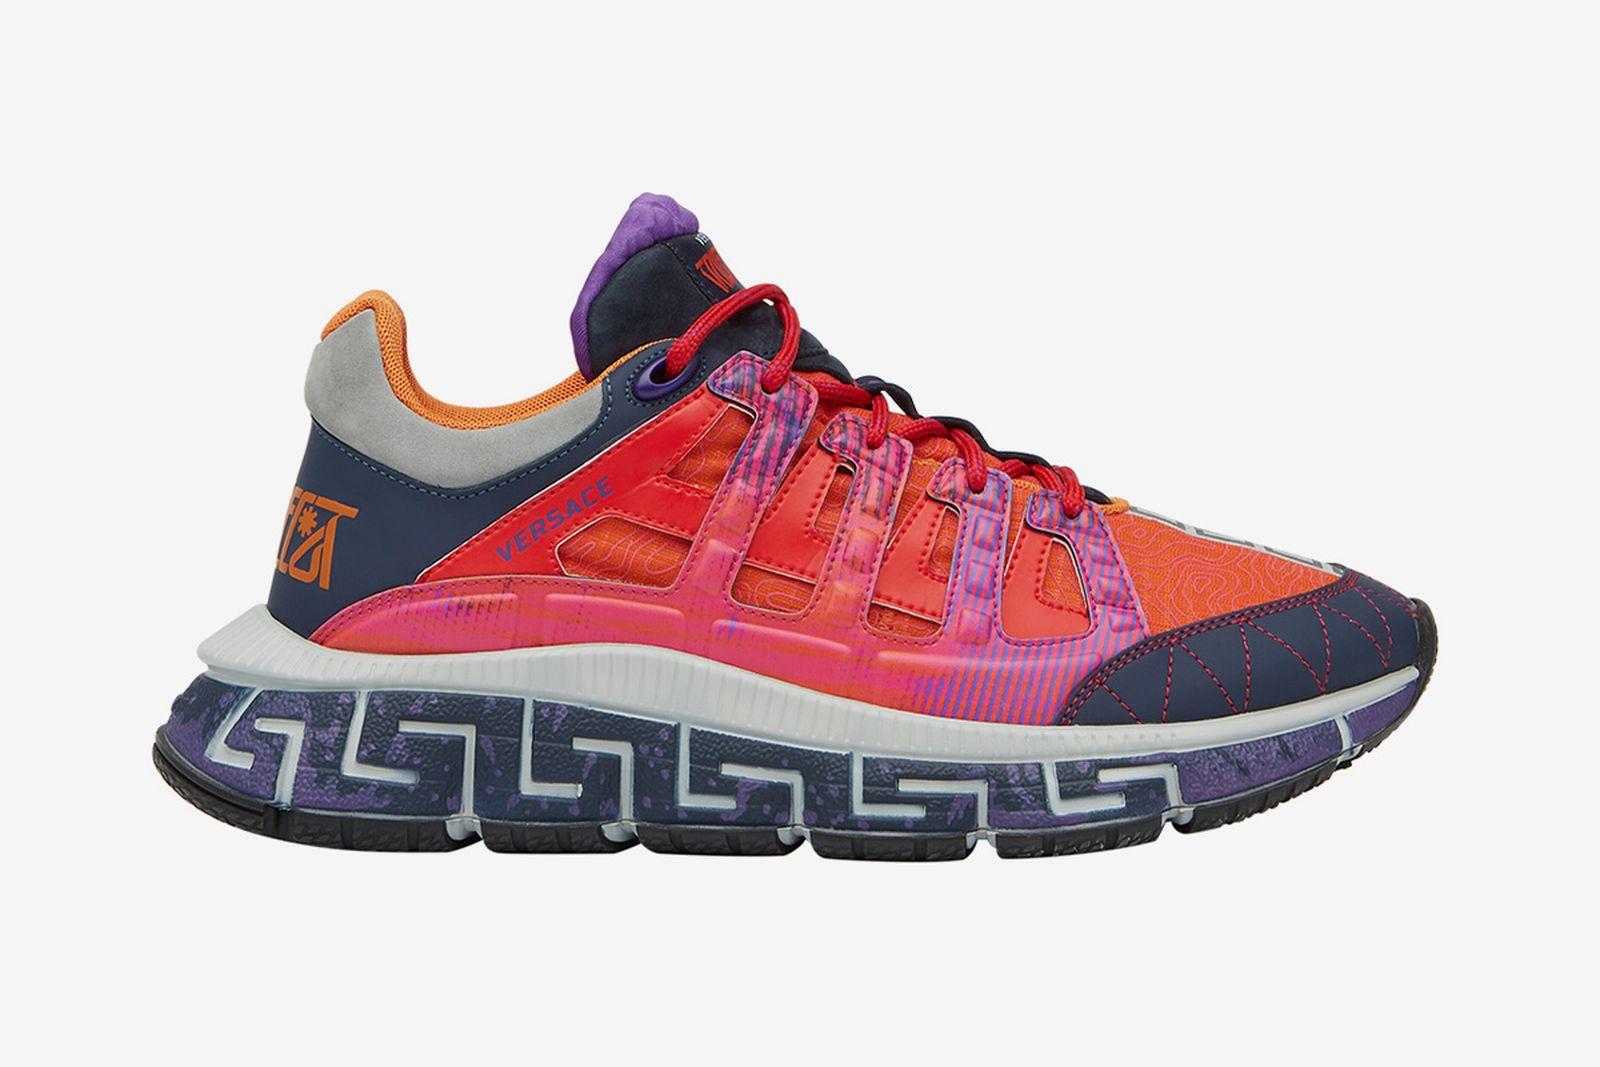 versace-trigreca-sneaker-release-date-price-03